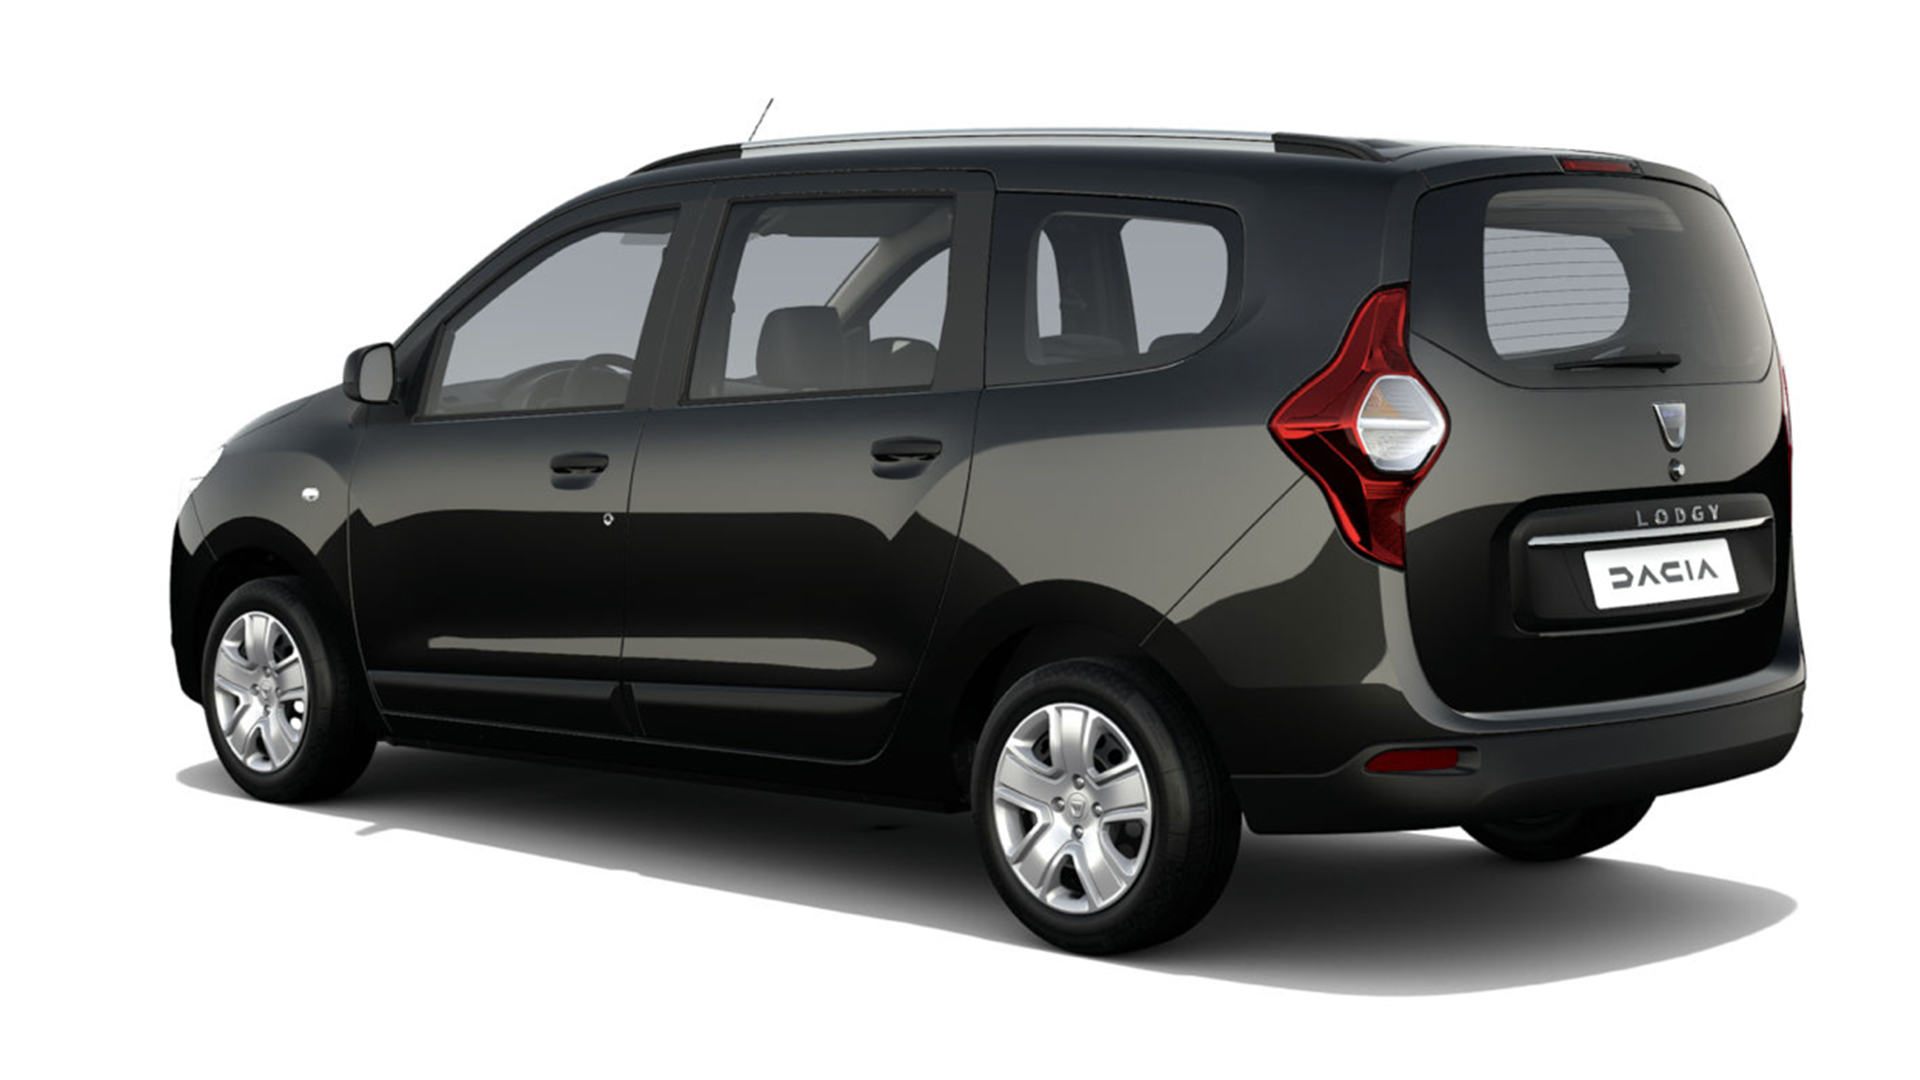 Dacia Lodgy trasera